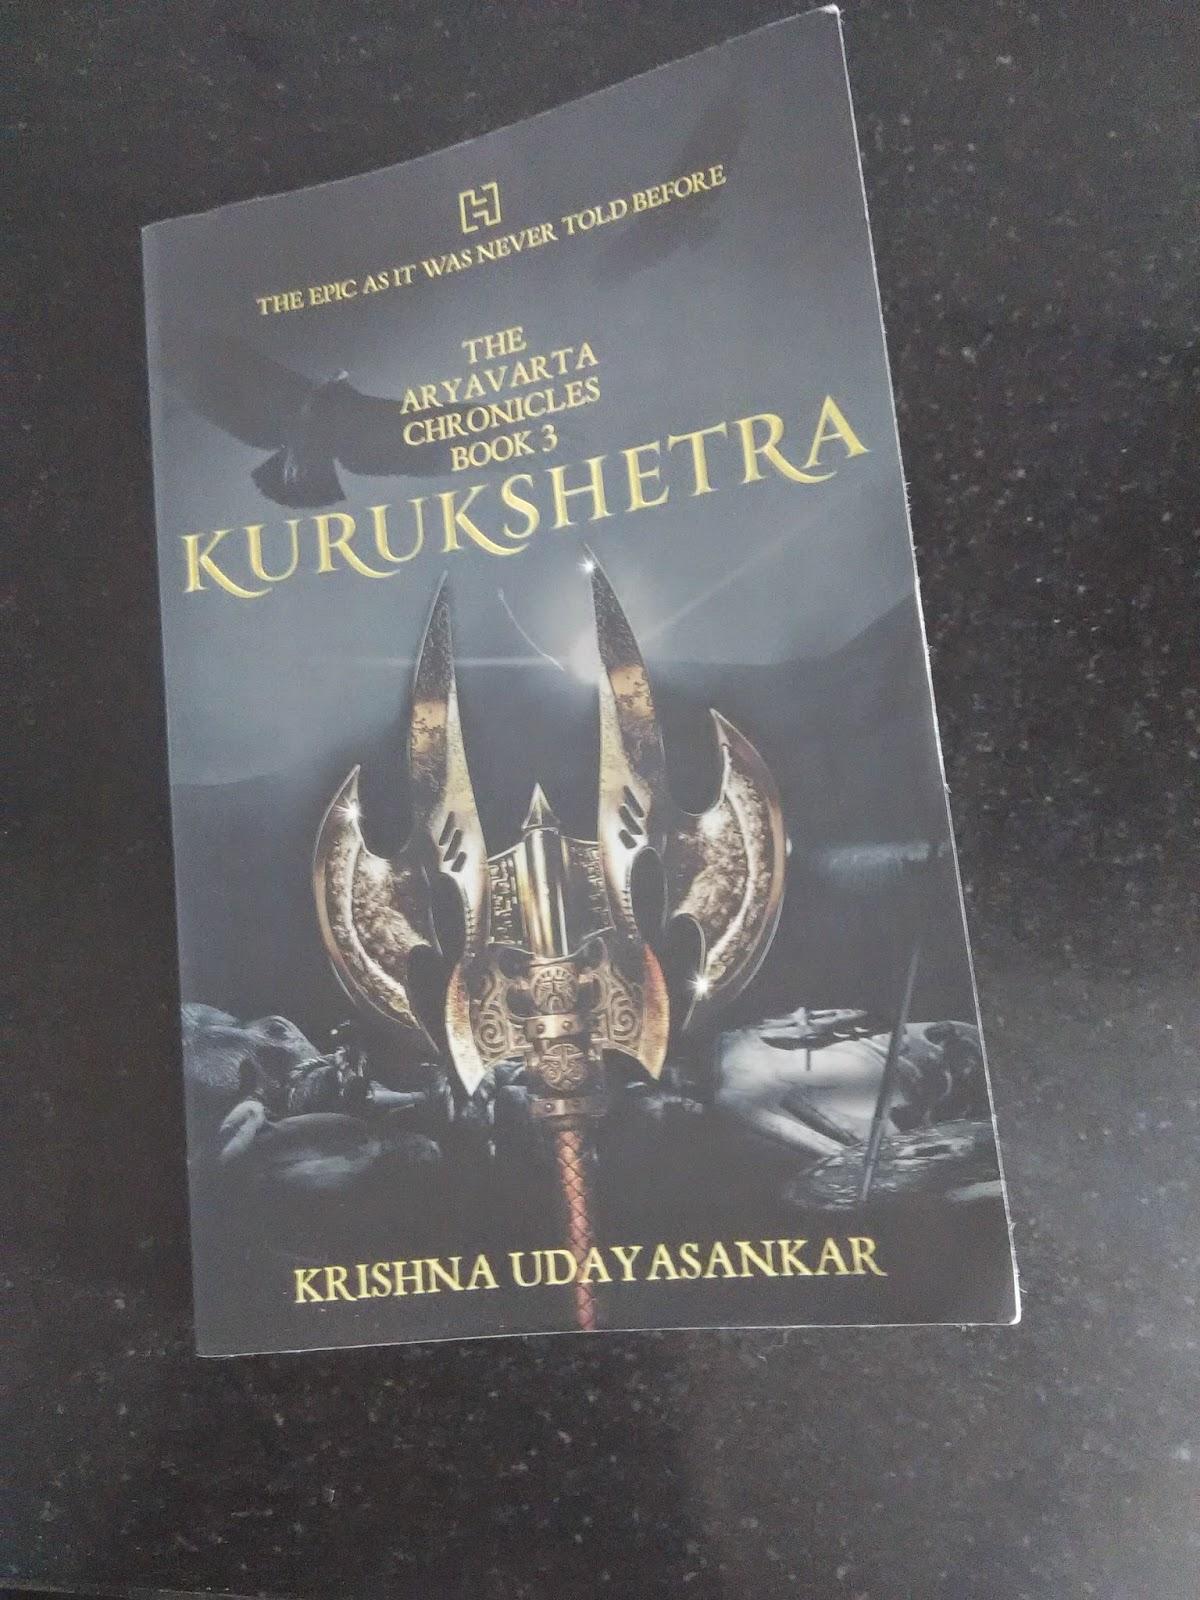 book review, kurukshetra, aryavarta chronicles, blogger review, goodreads, krishna udyasankar, book three of aryavarta chronicles review, mumbai, indian mythology, india authors